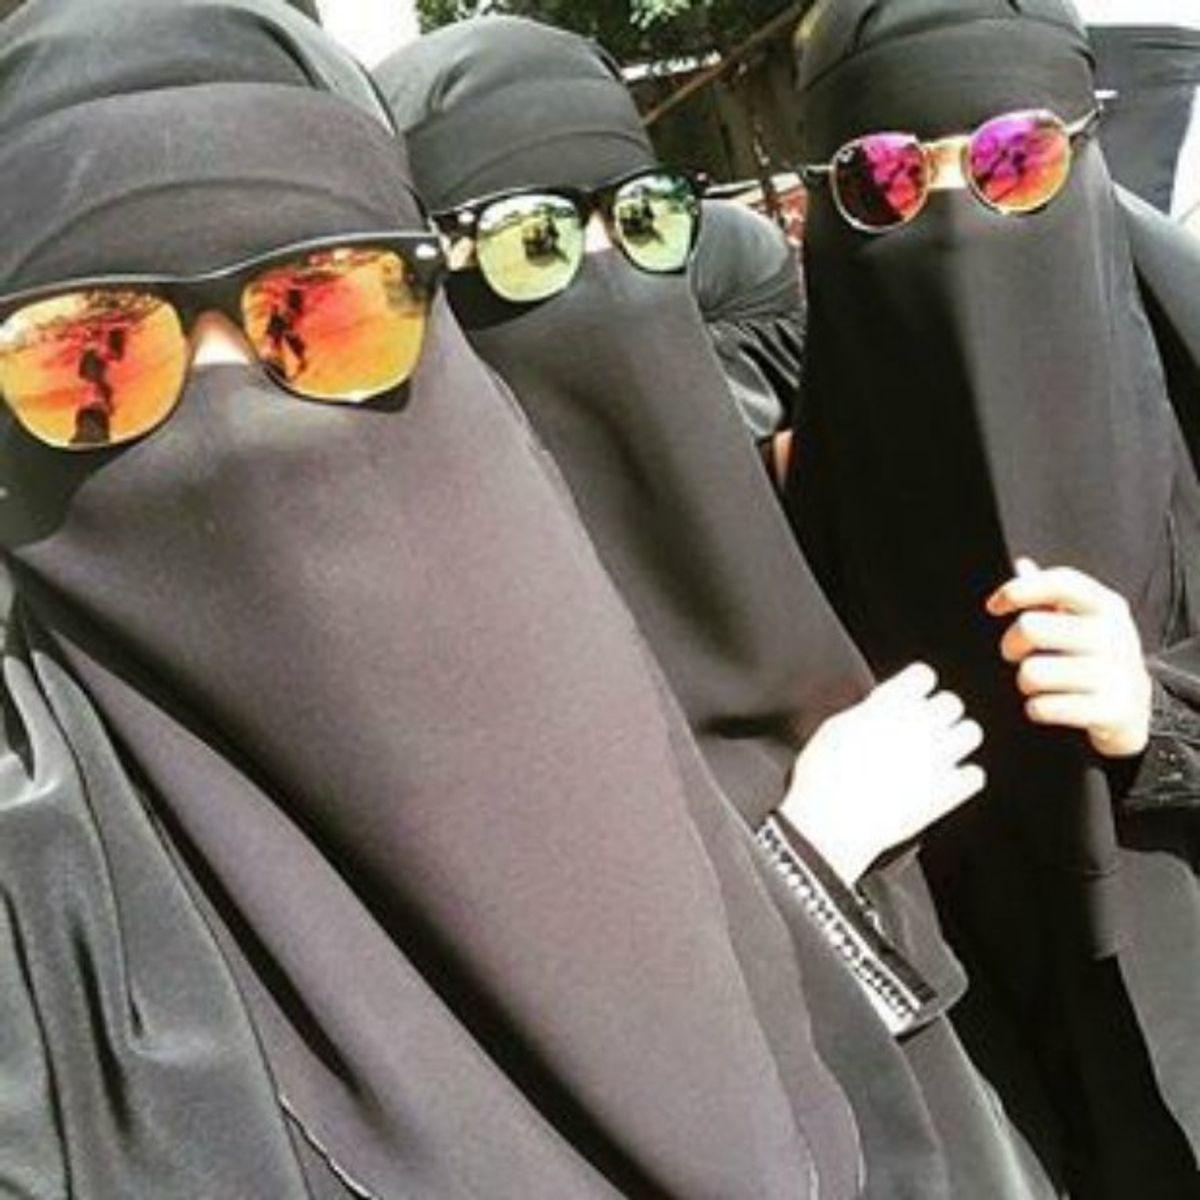 Does The Niqab Impair Communication?